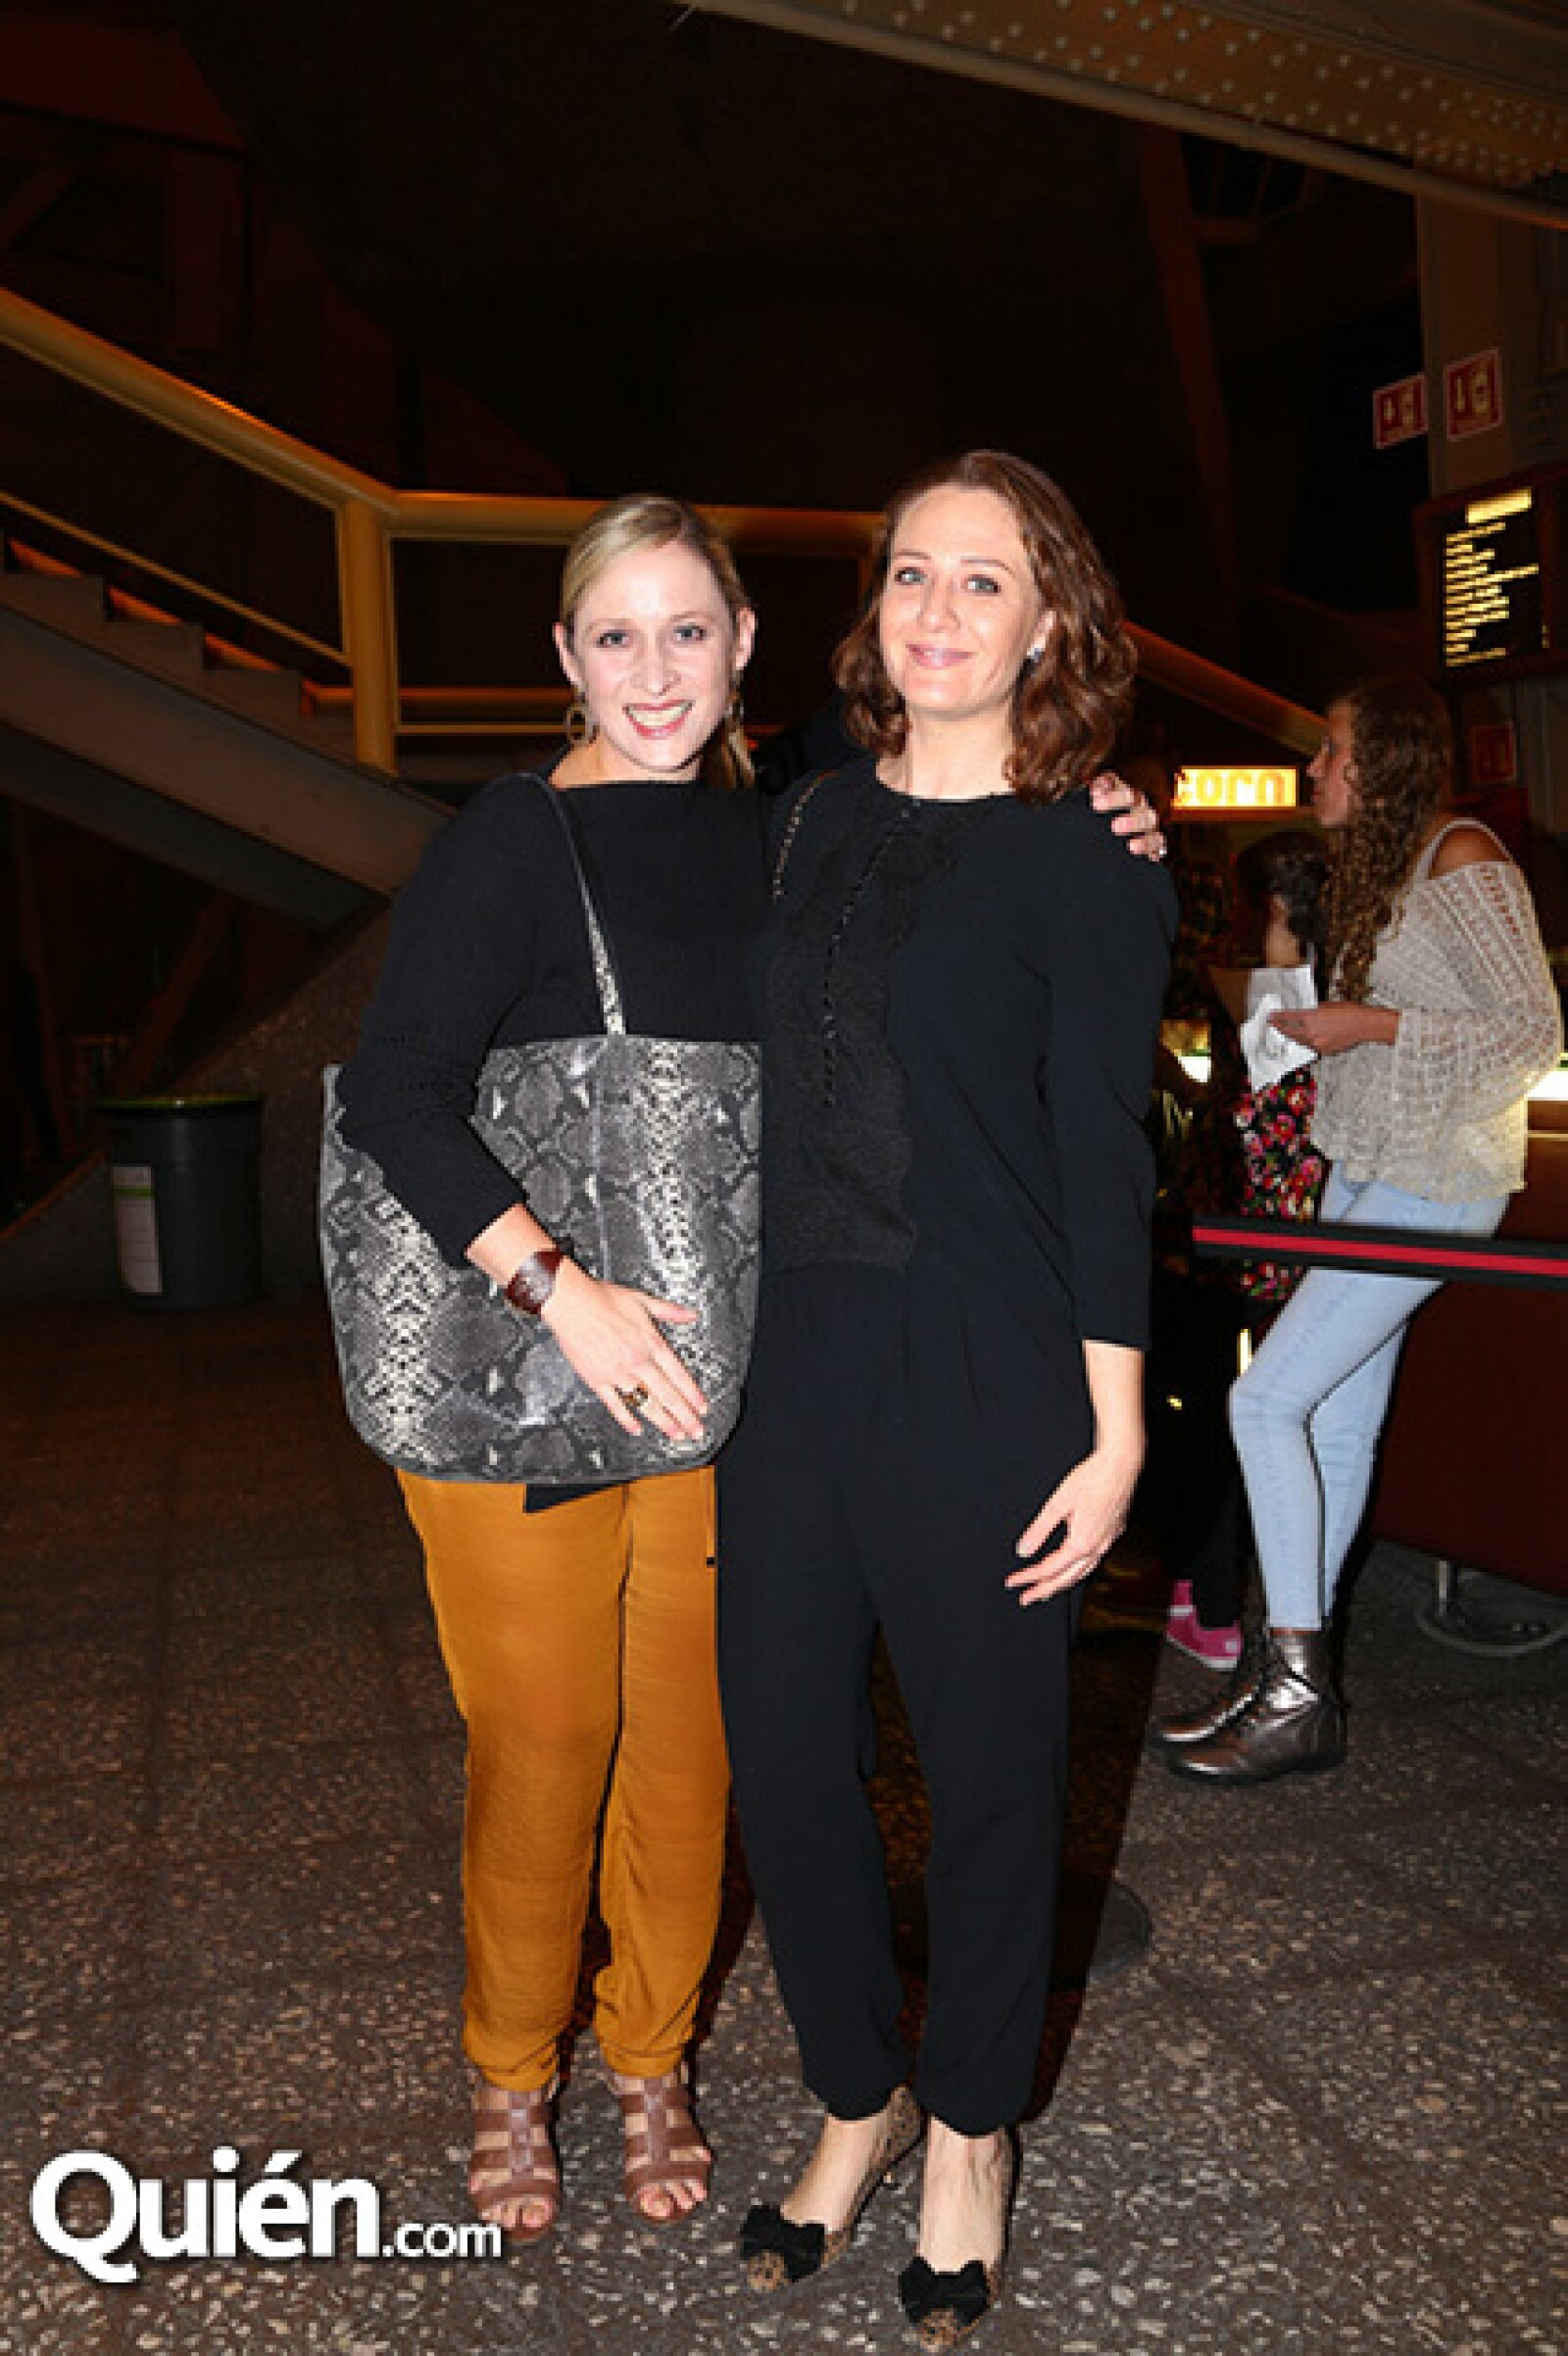 Patricia Gout y Christianne Keller